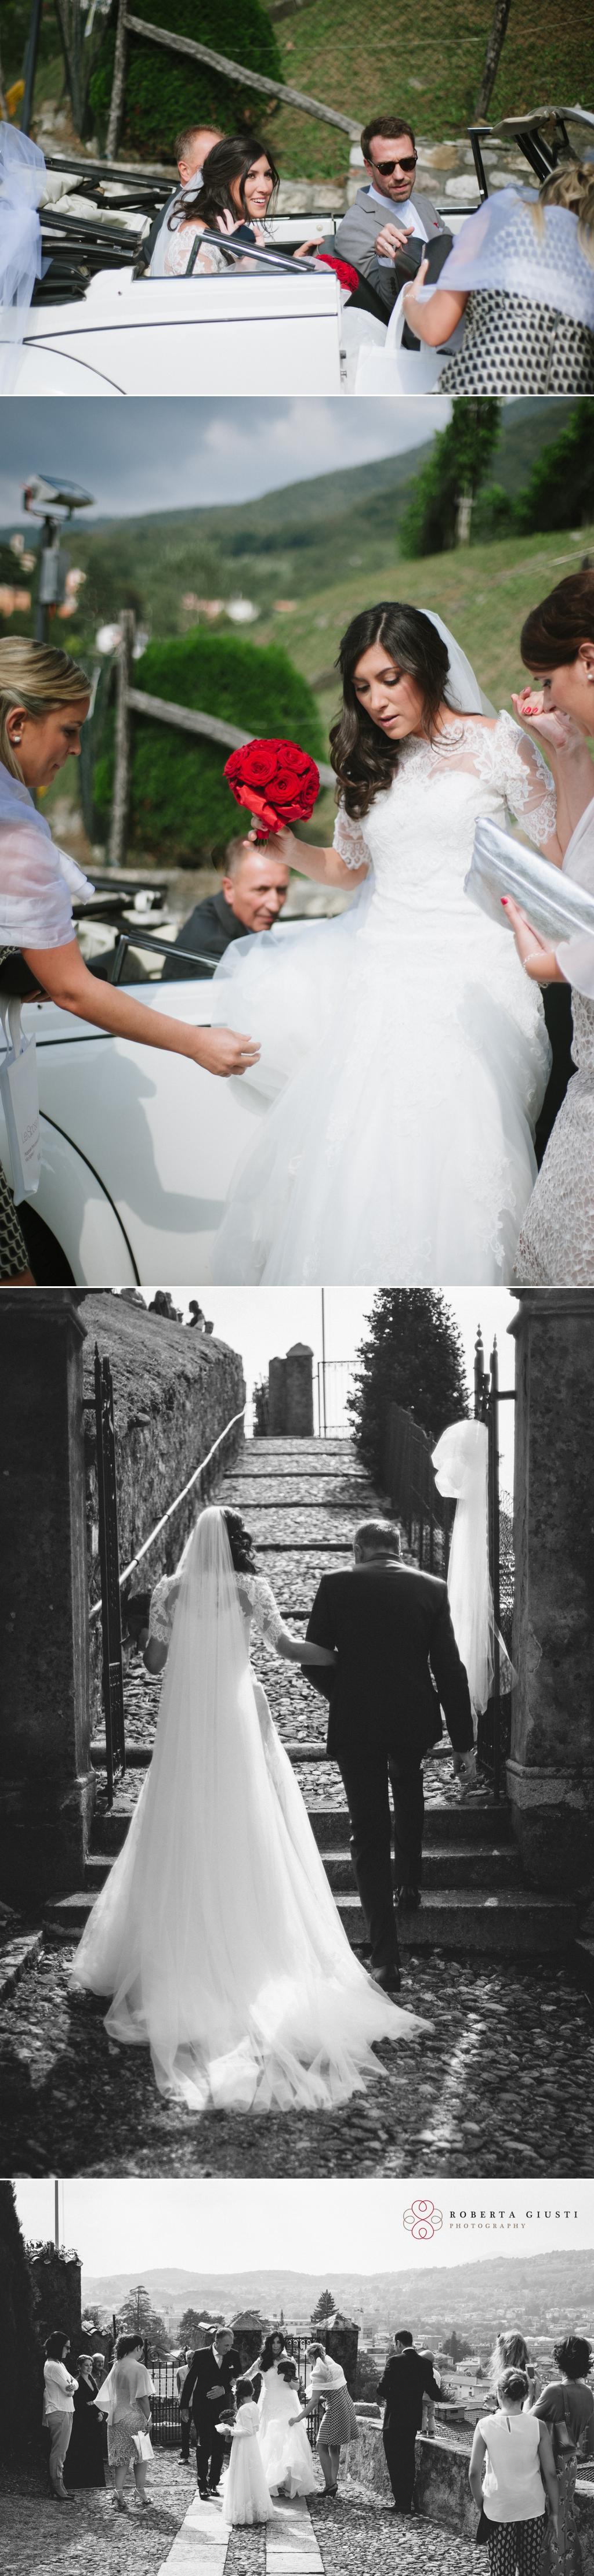 Fotografo matrimonio arrivo sposa